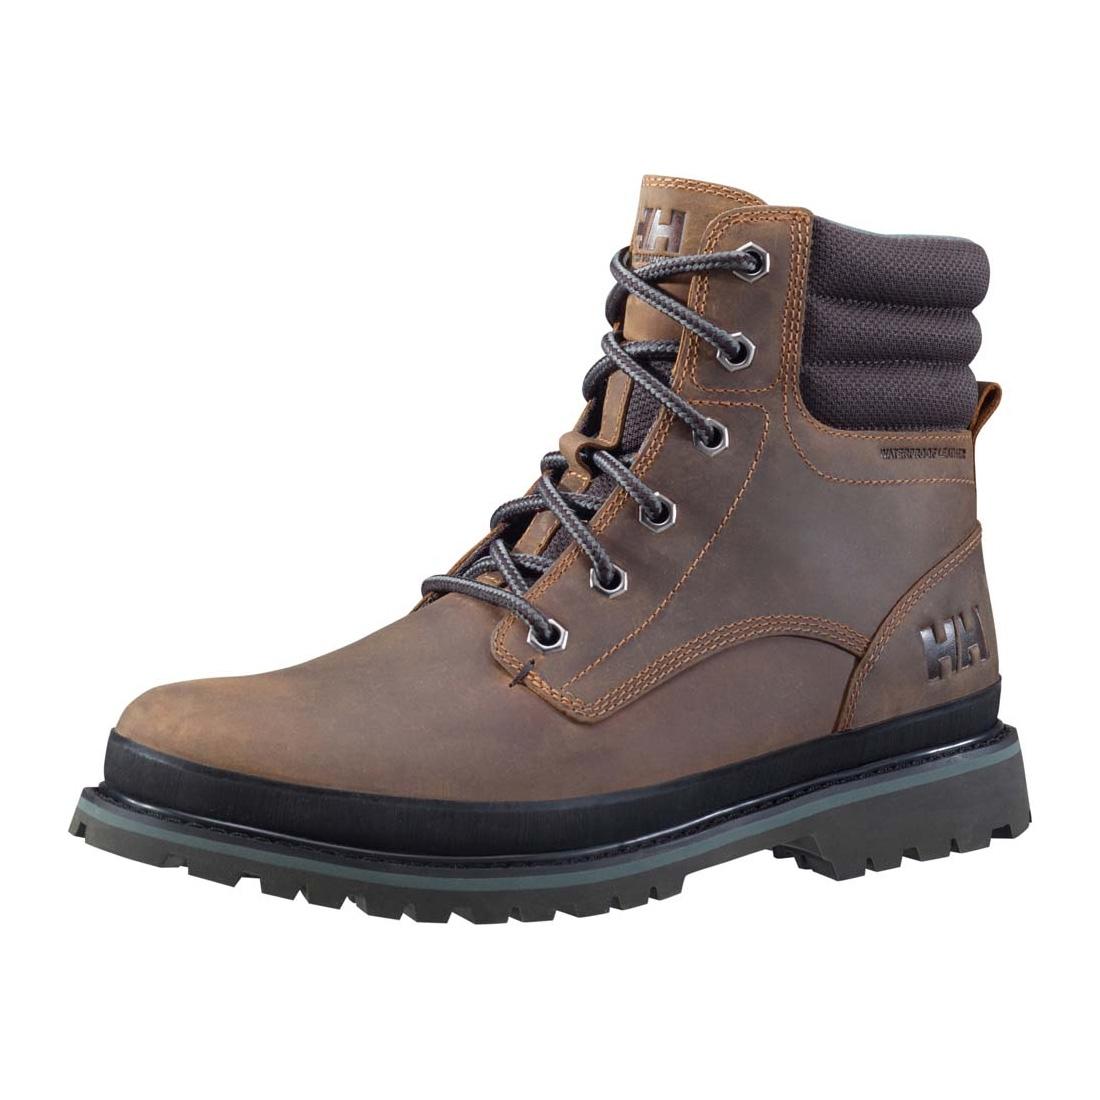 helly hansen gataga winter boots s tobacco brown